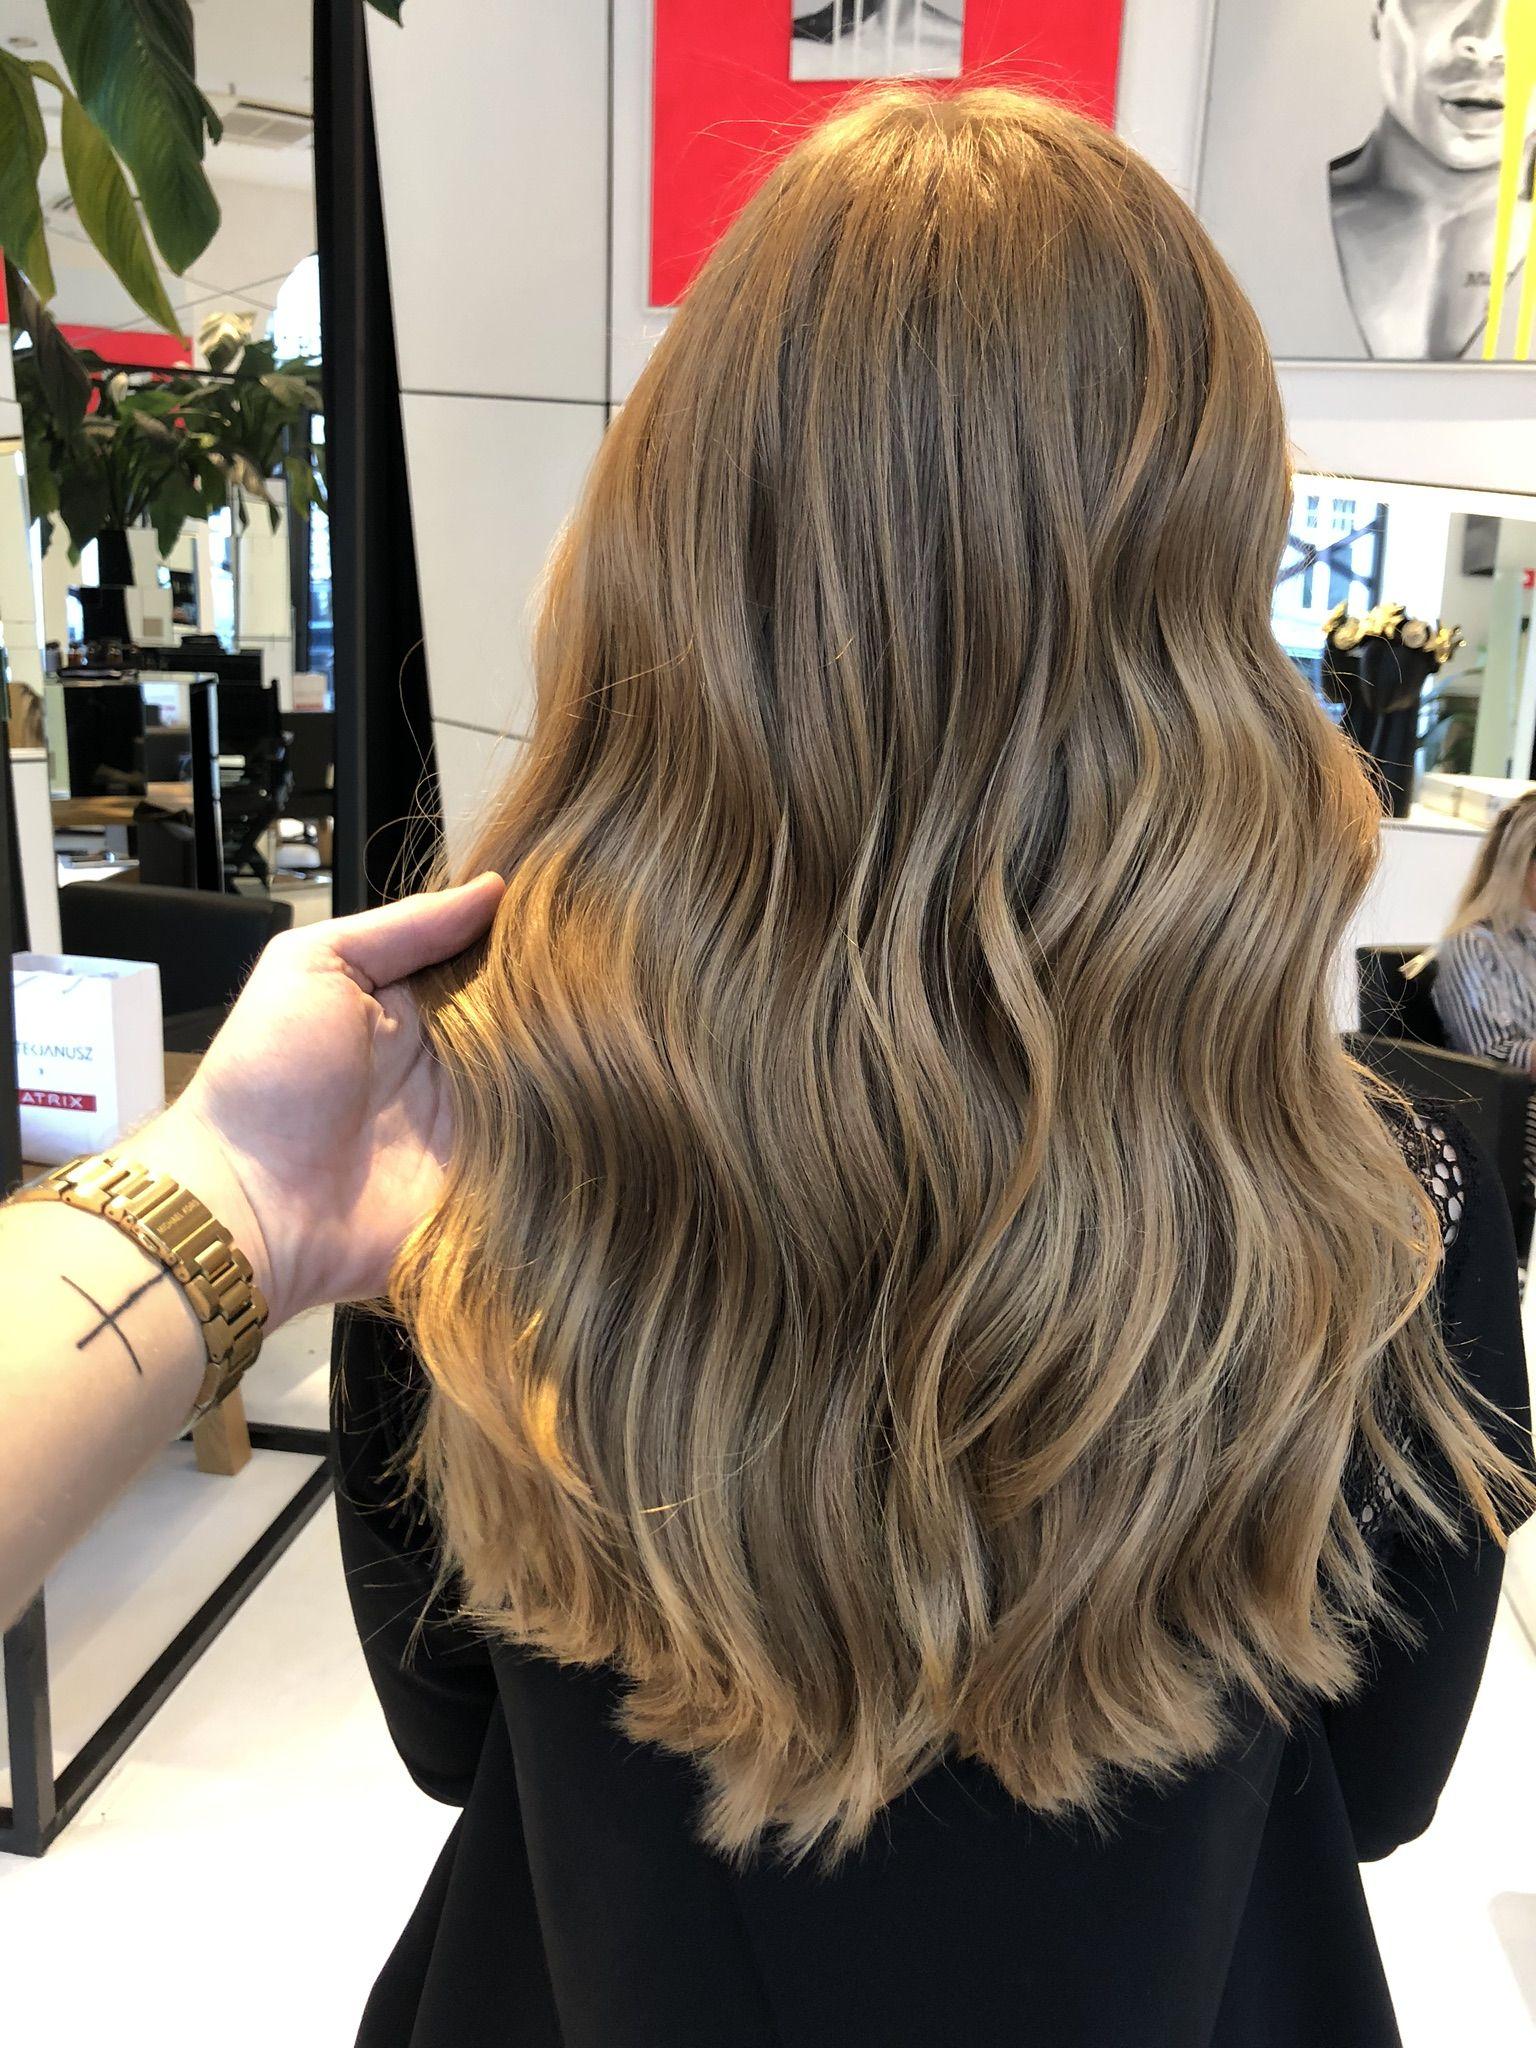 Rozjasnianie Wlosow Hair Styles Long Hair Styles Hair